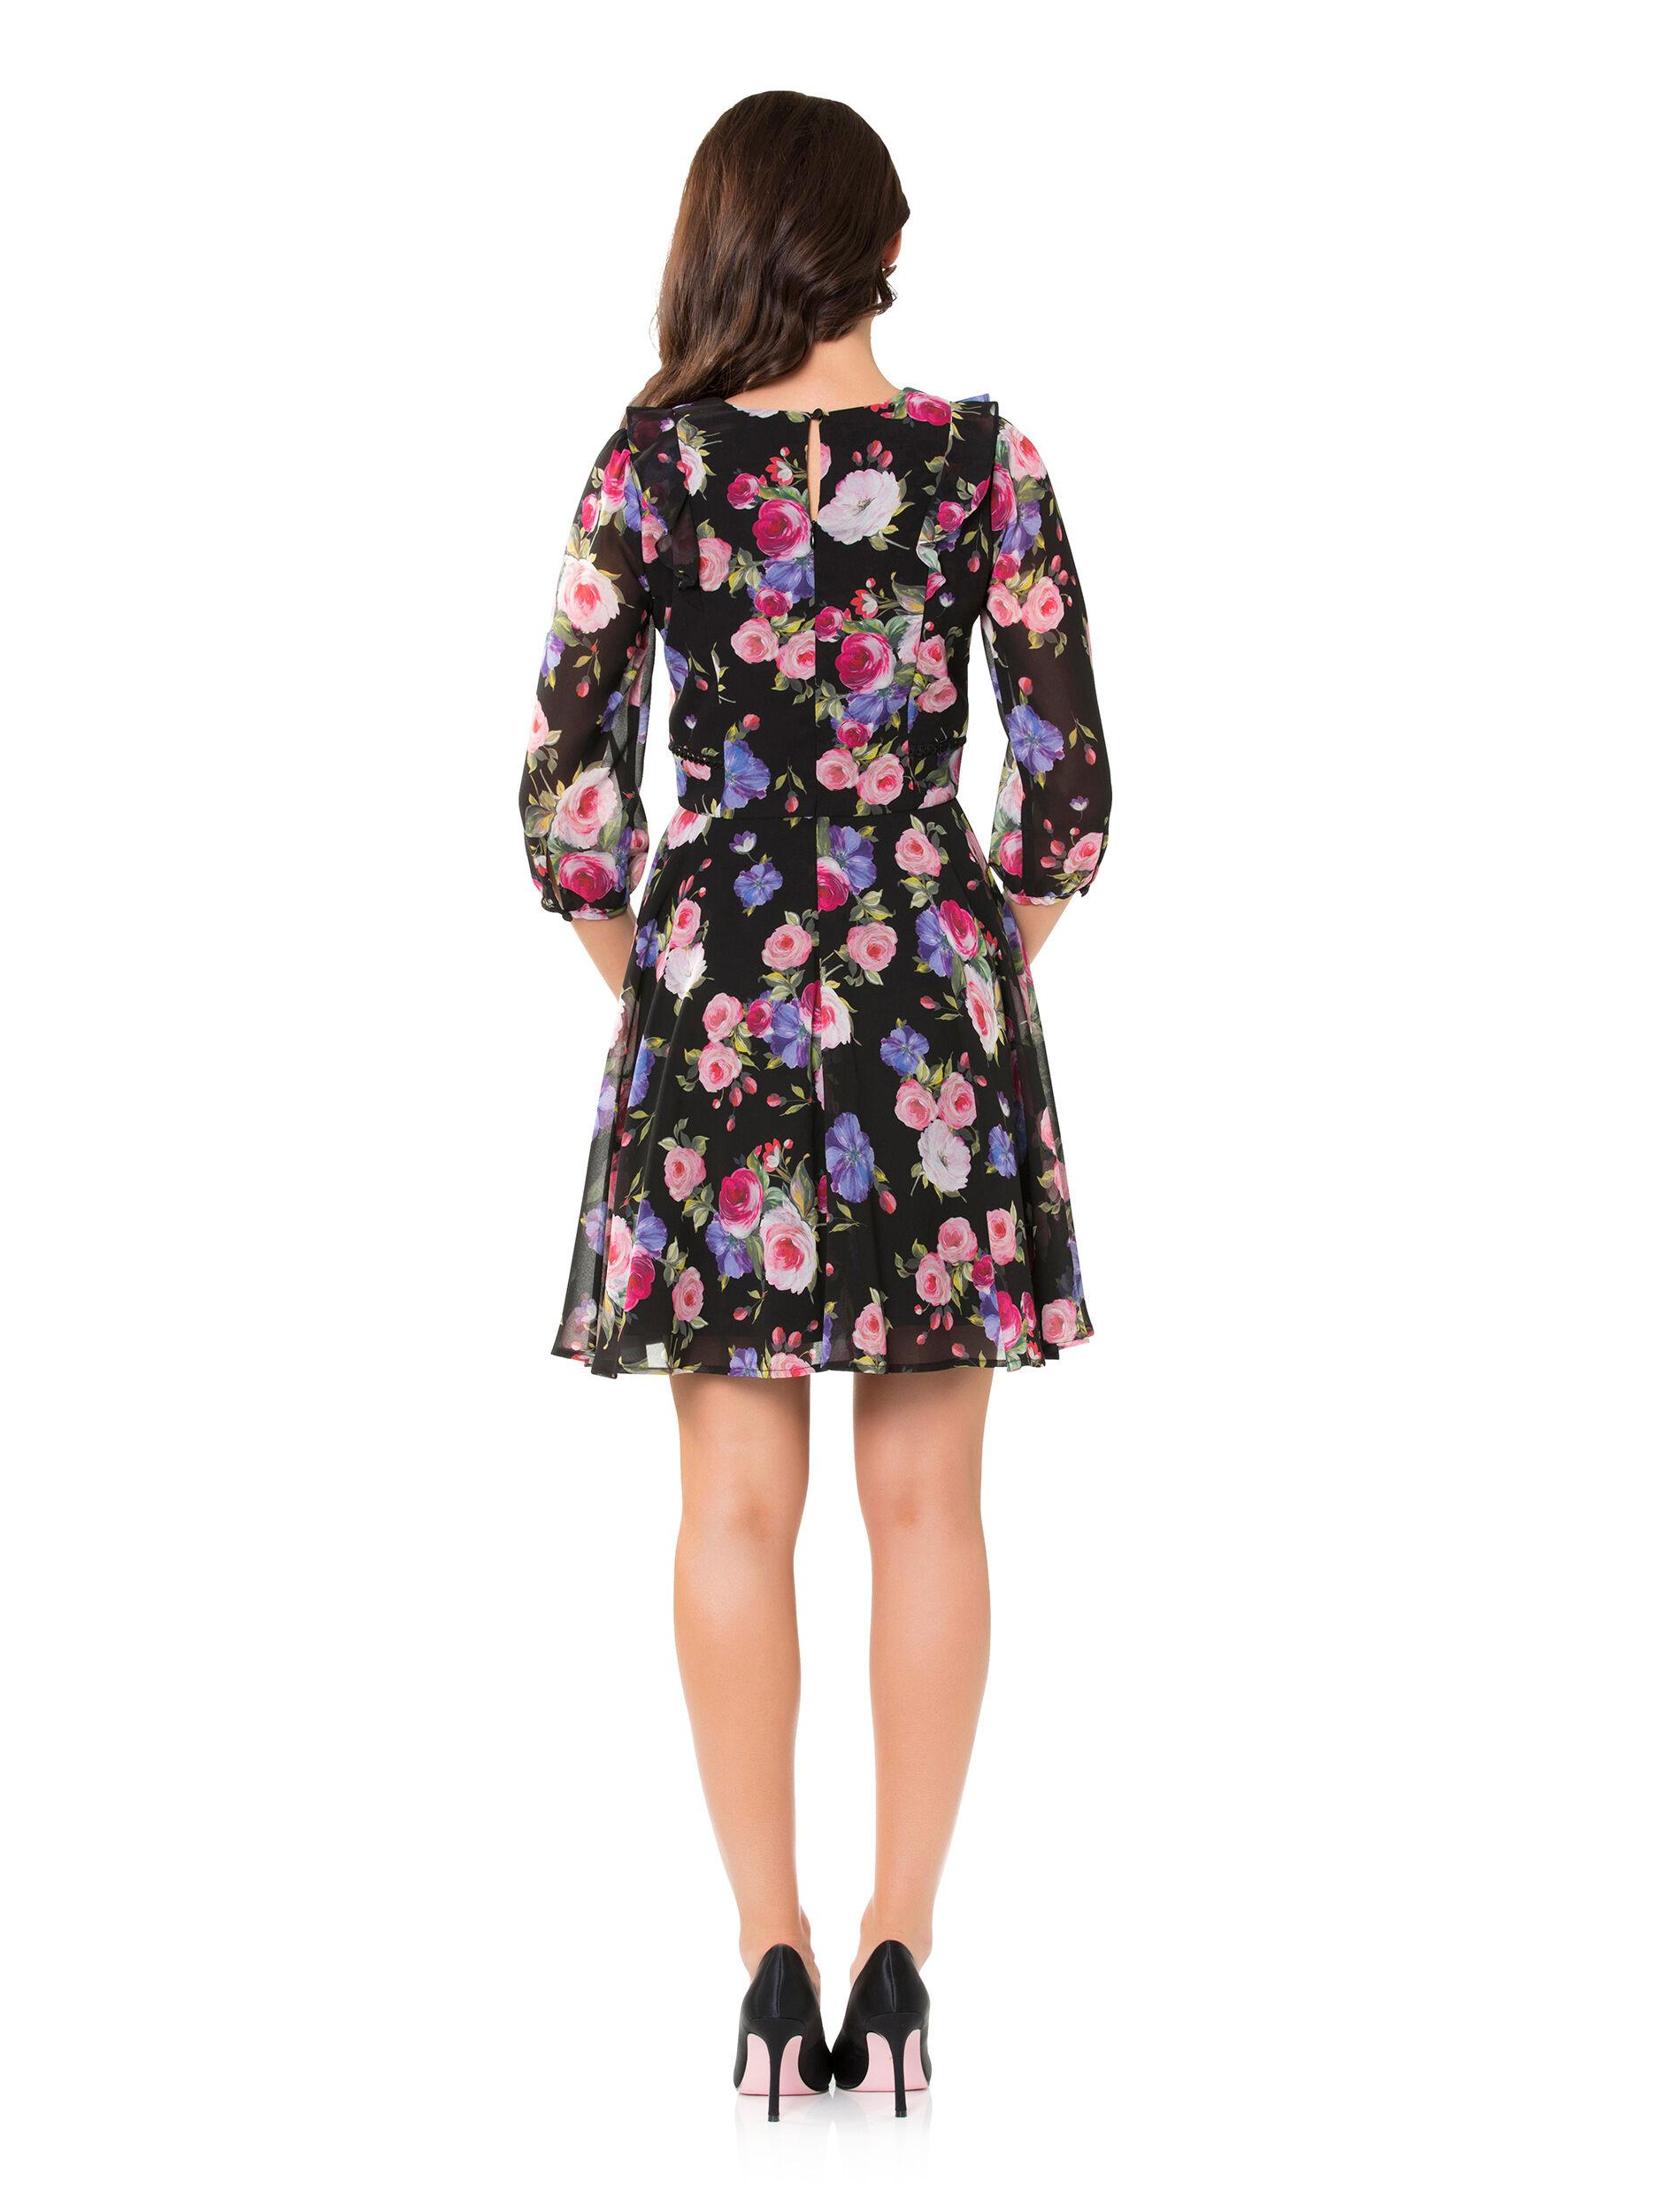 Mi Amore Floral Dress